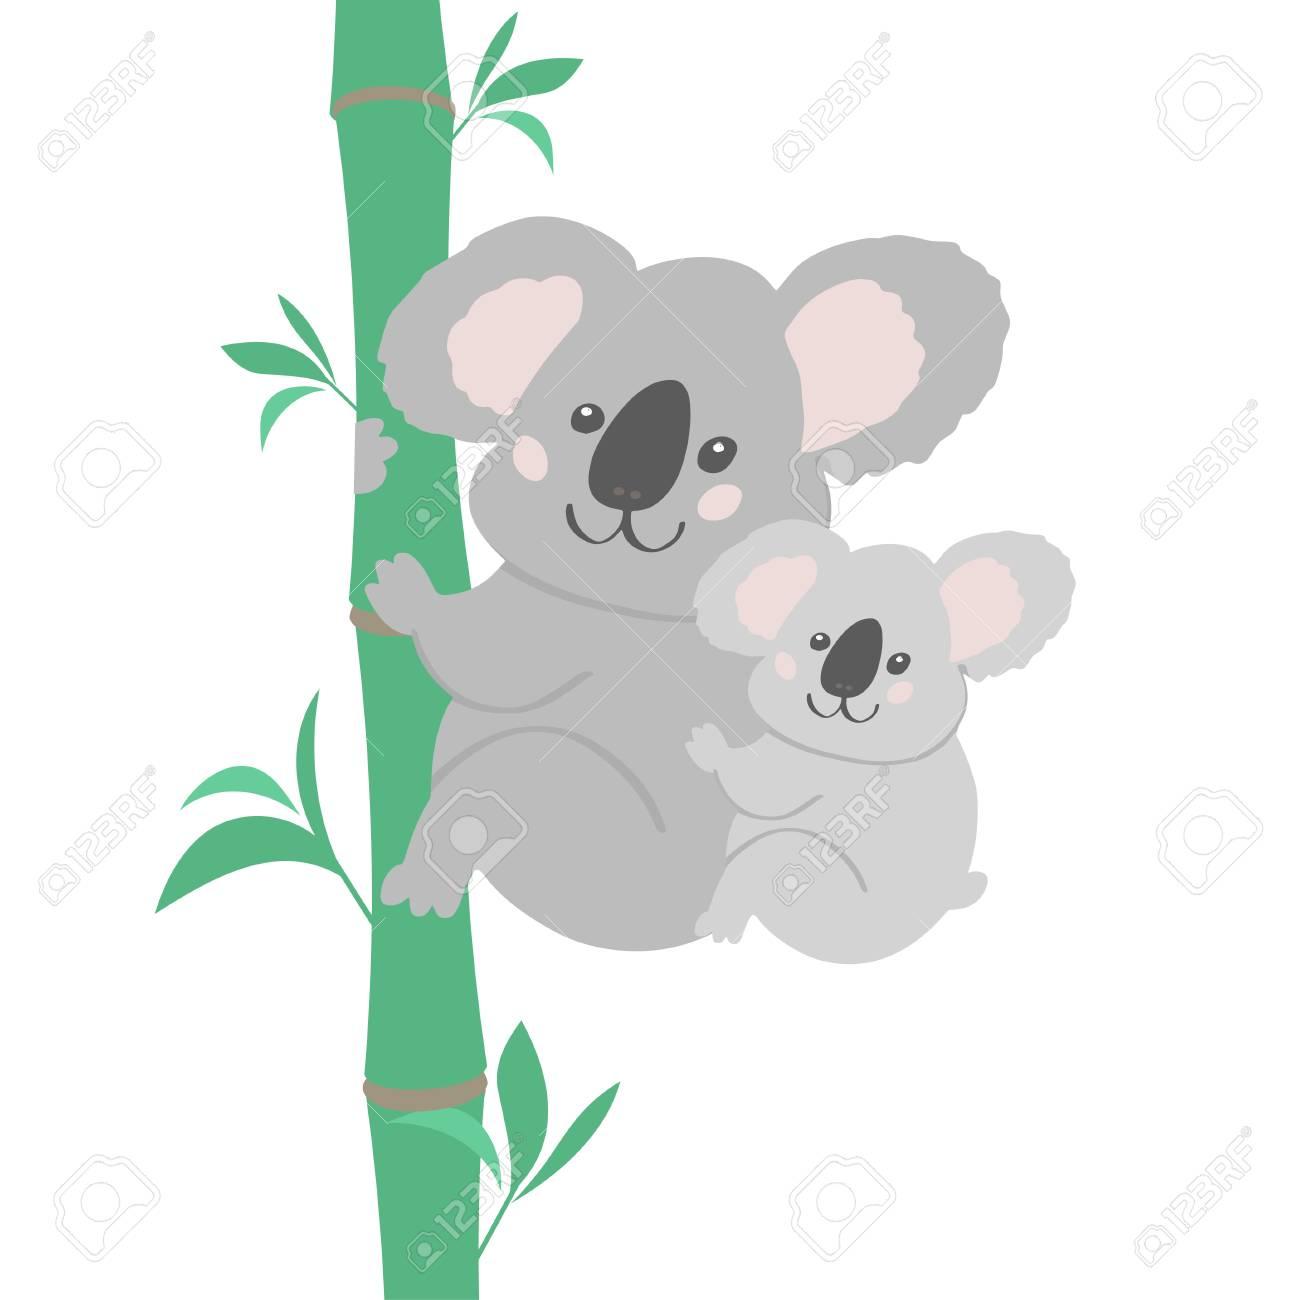 Vector Illustration Of Cute Bear Koala Family Small Koala Sitting